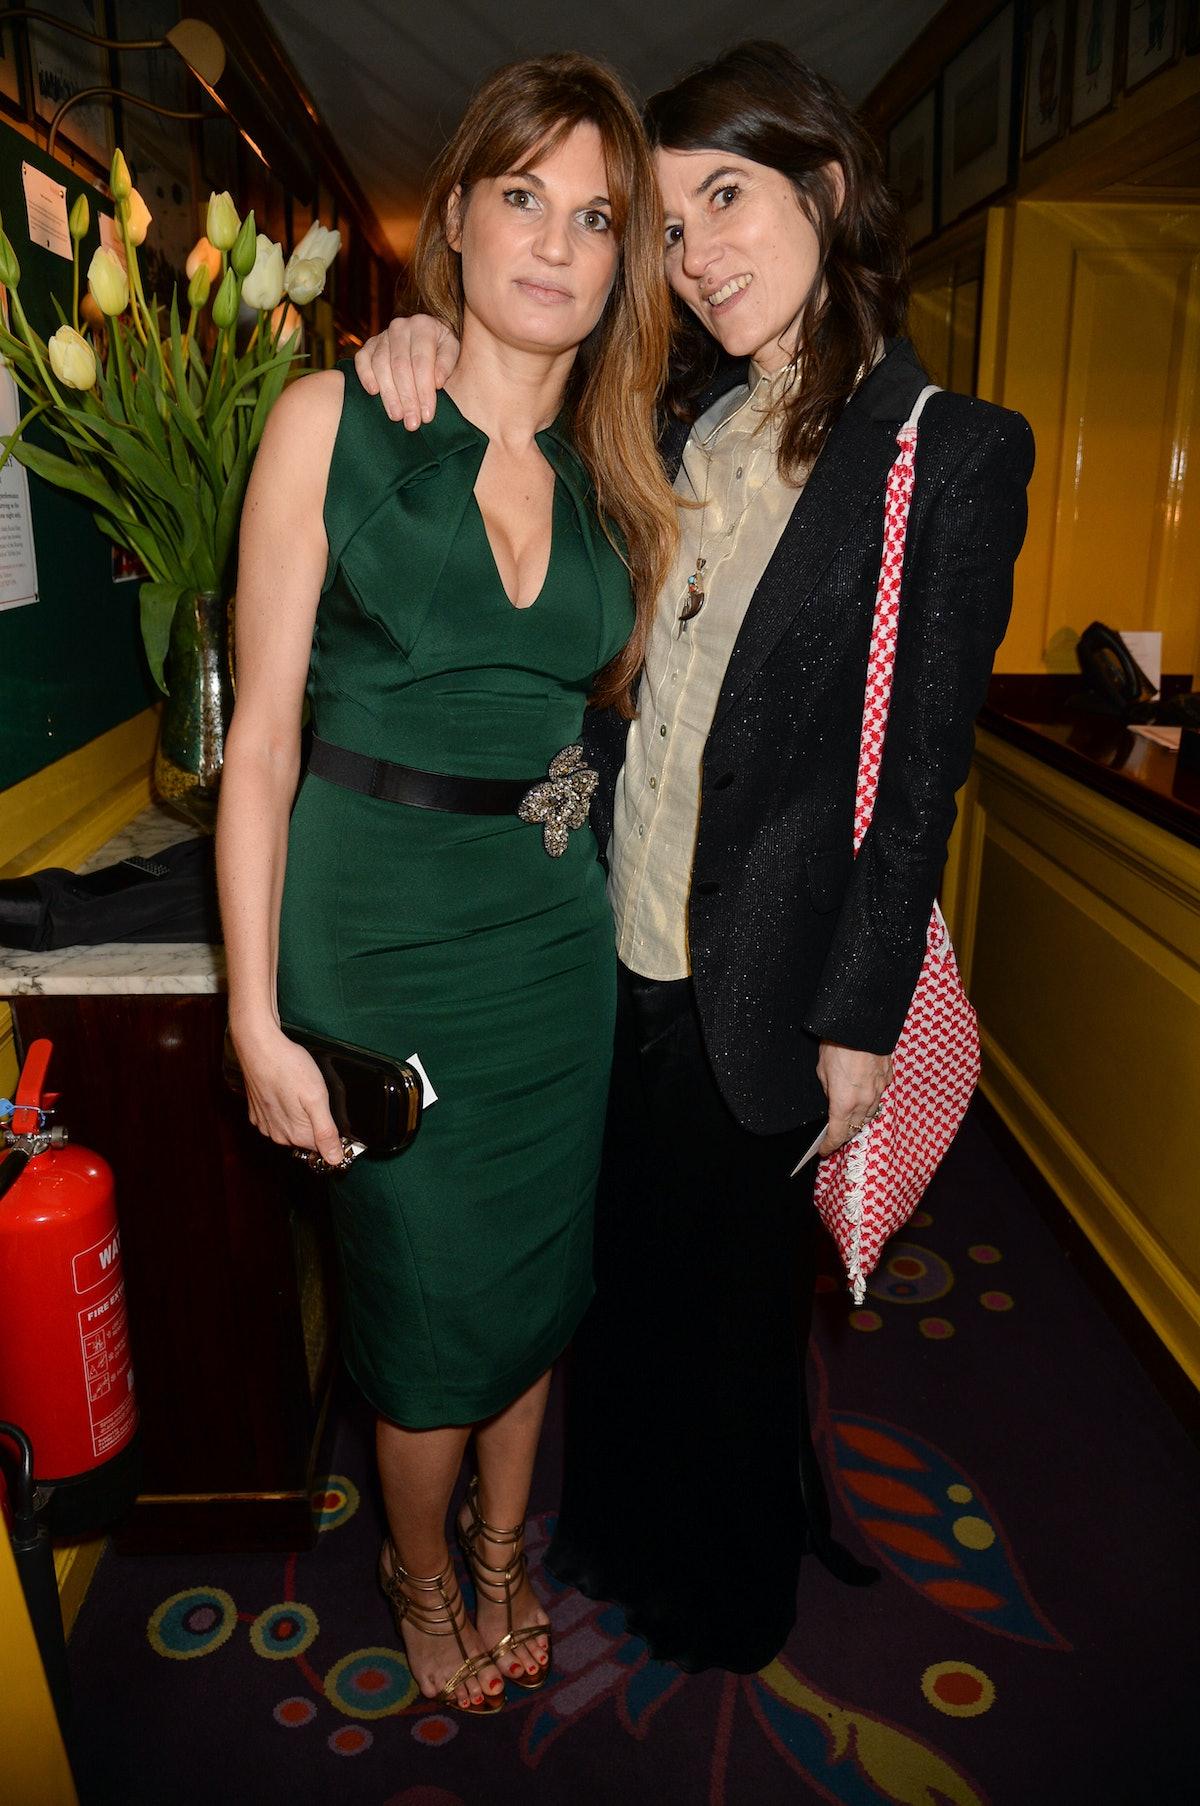 Jemima Goldsmith and Bella Freud